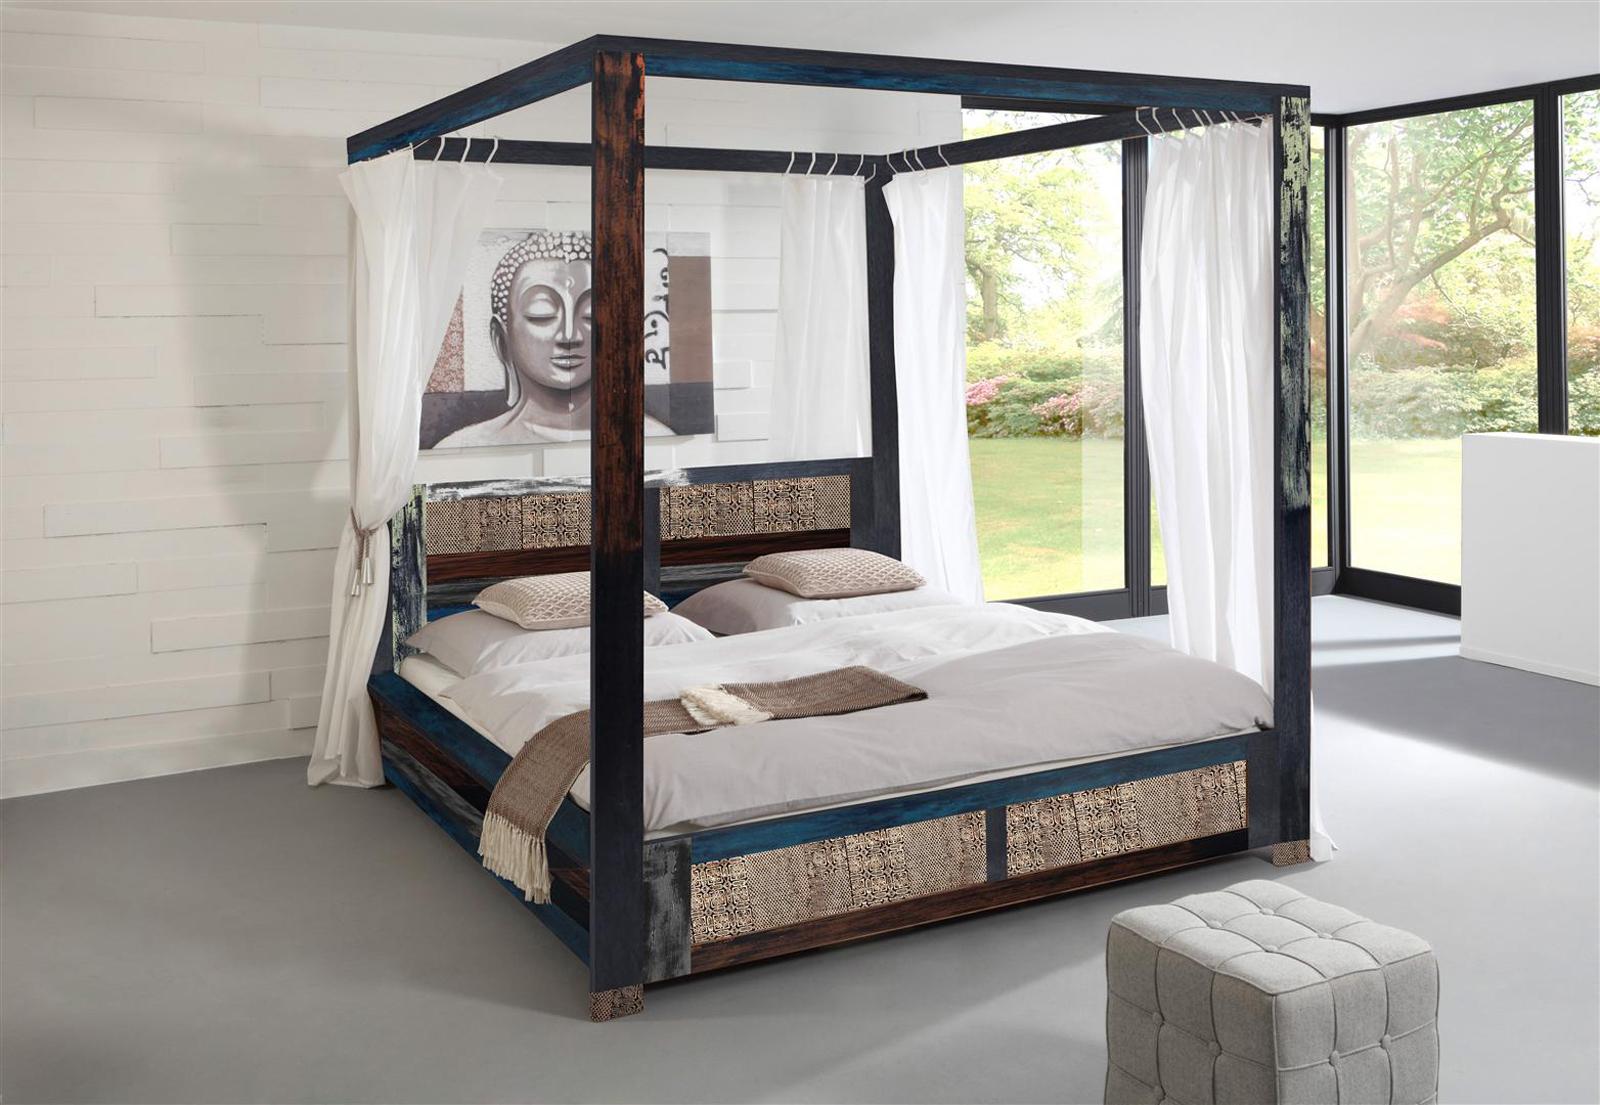 sam vintage himmelbett holzbett metall 180 x 200 cm bunt. Black Bedroom Furniture Sets. Home Design Ideas